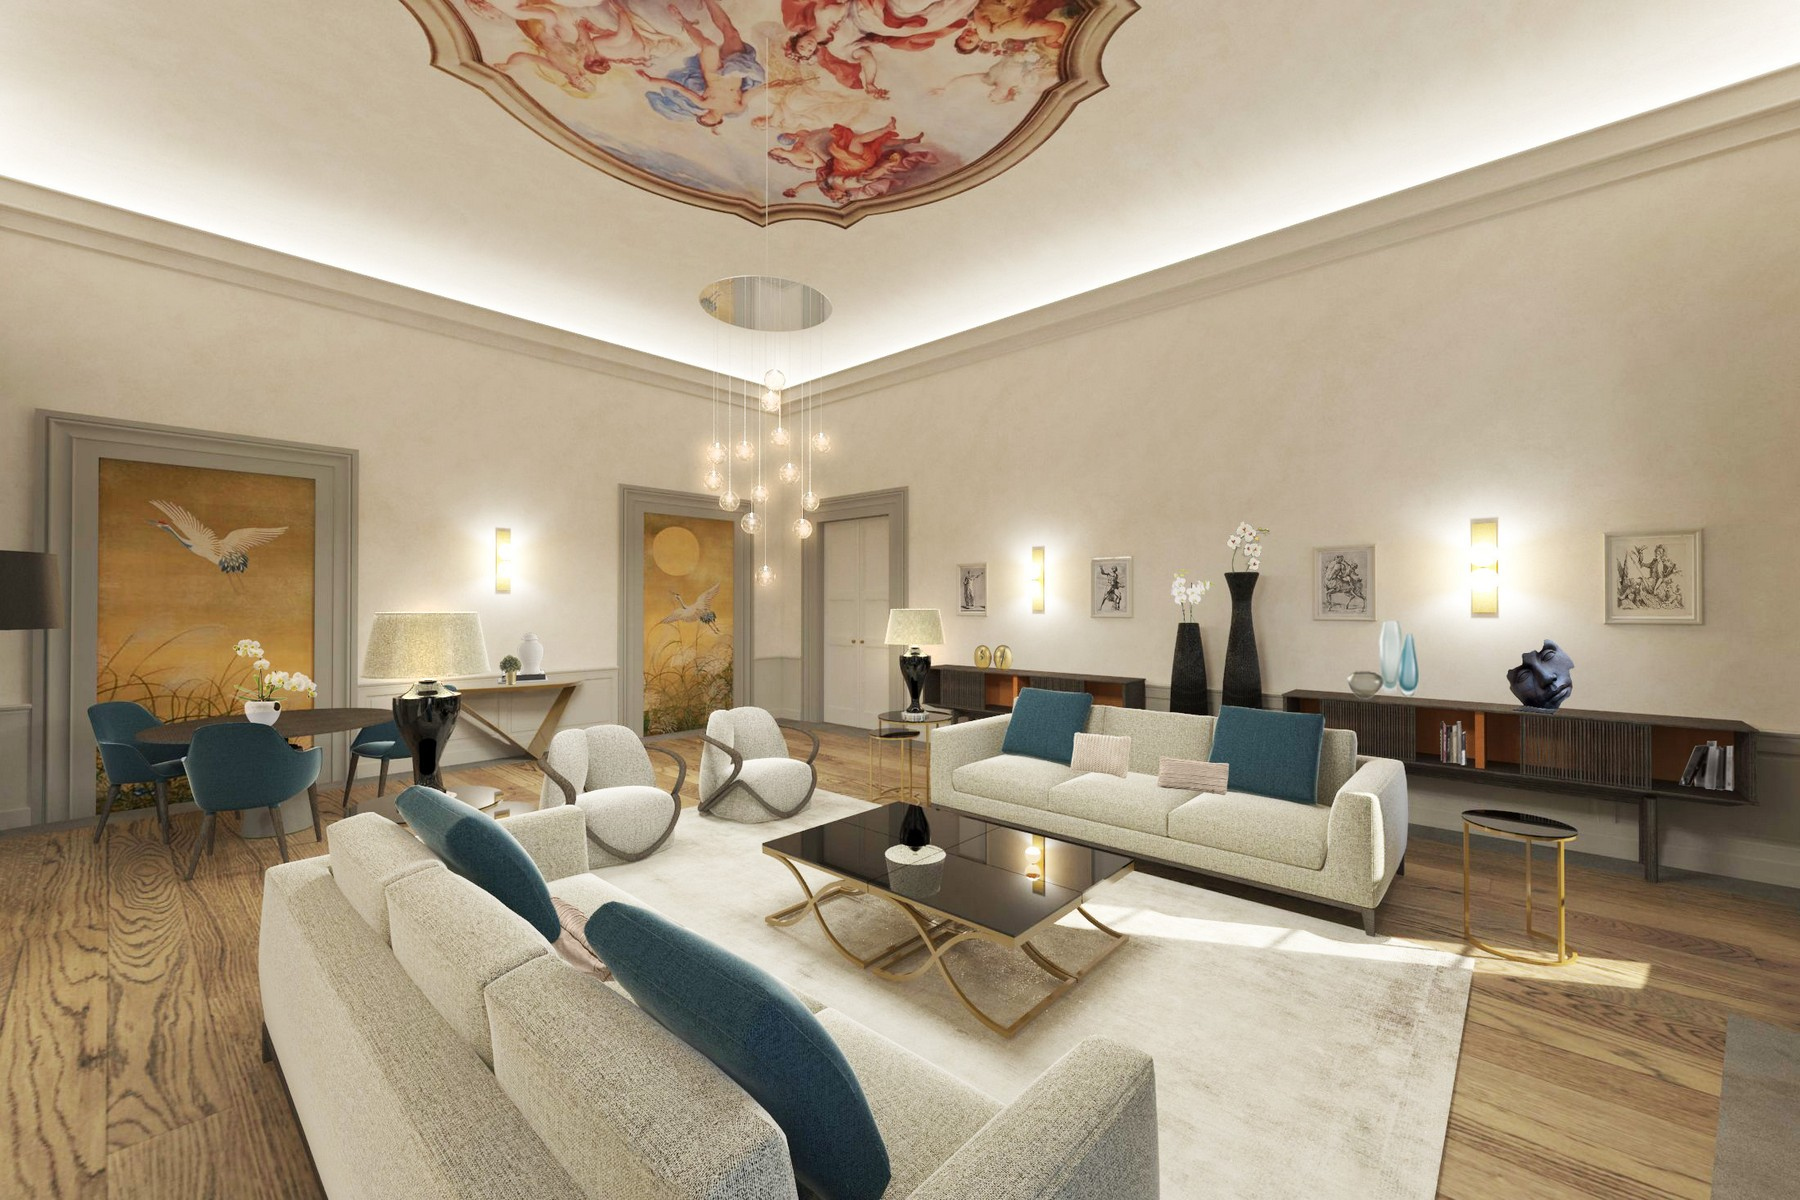 Appartamento in Vendita a Firenze via ghibellina